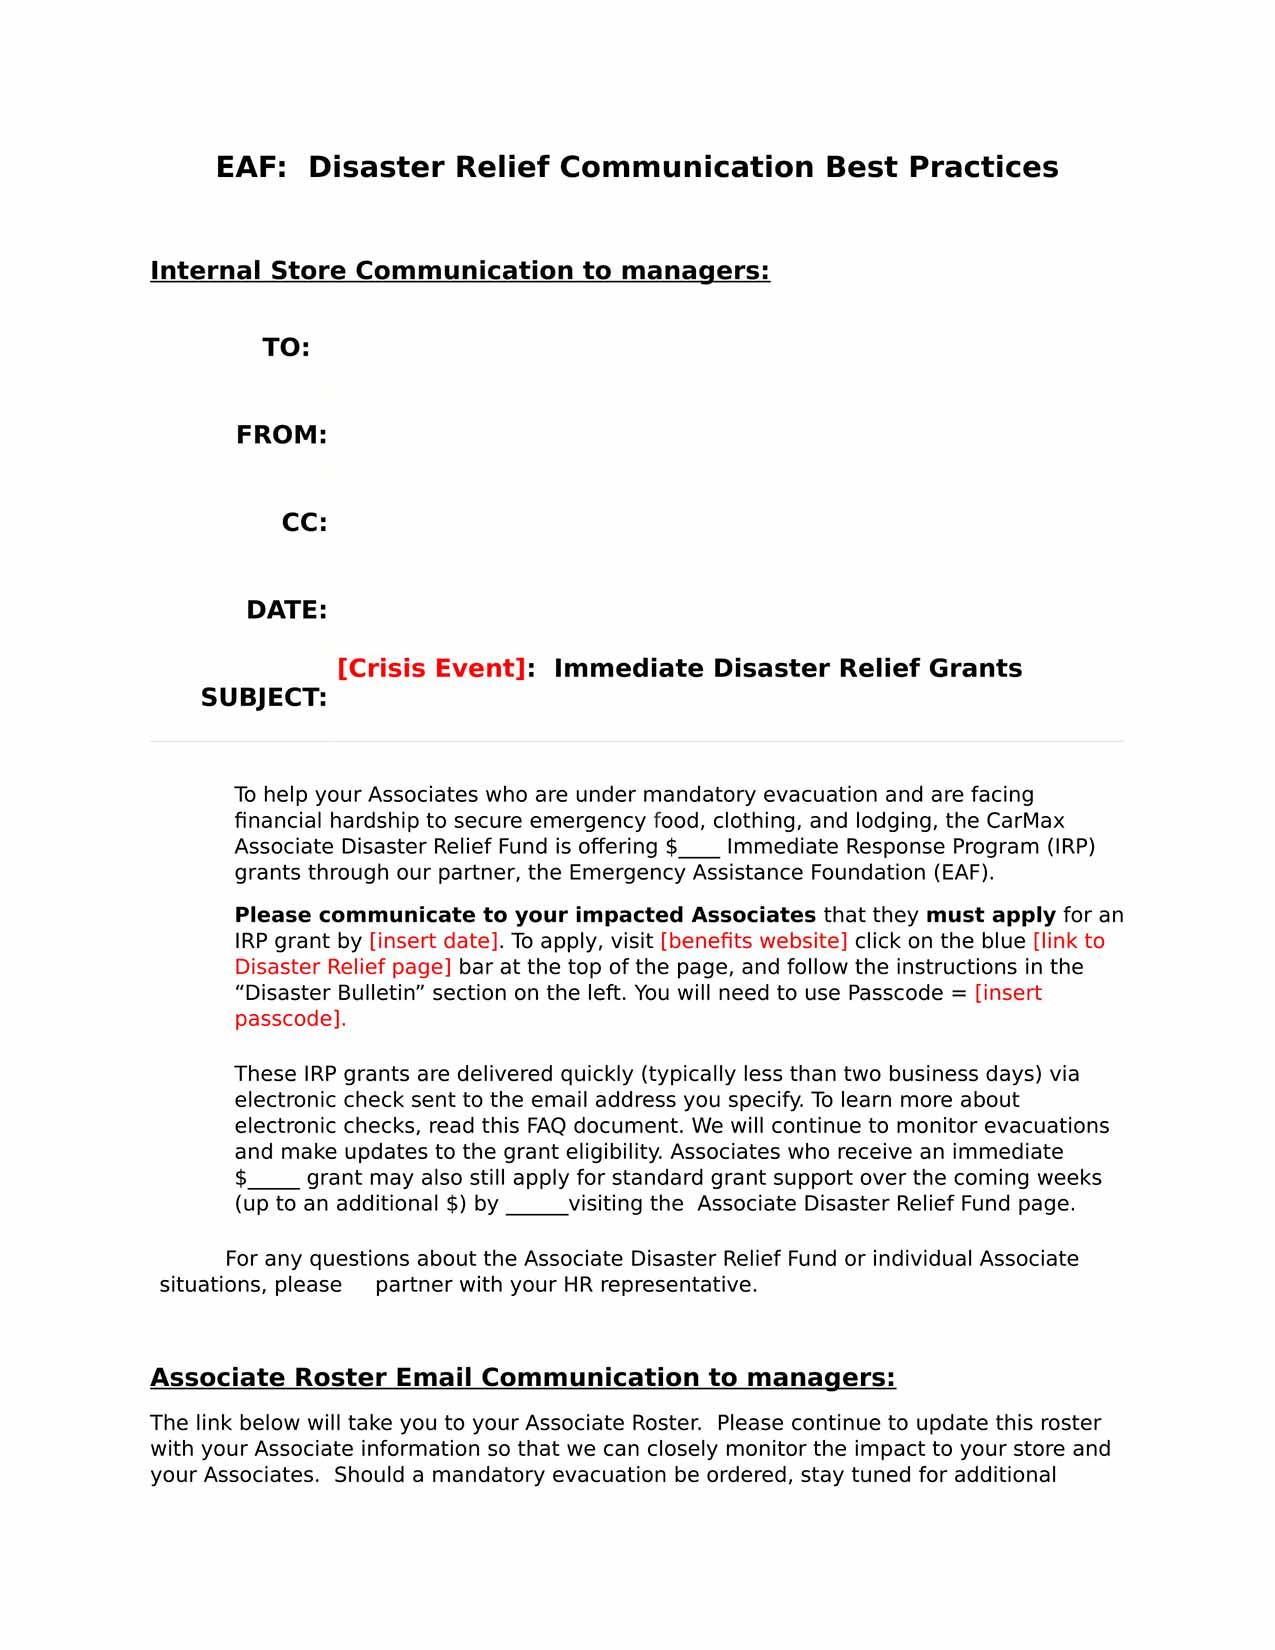 EAF-Communication-Best-Practices-cover